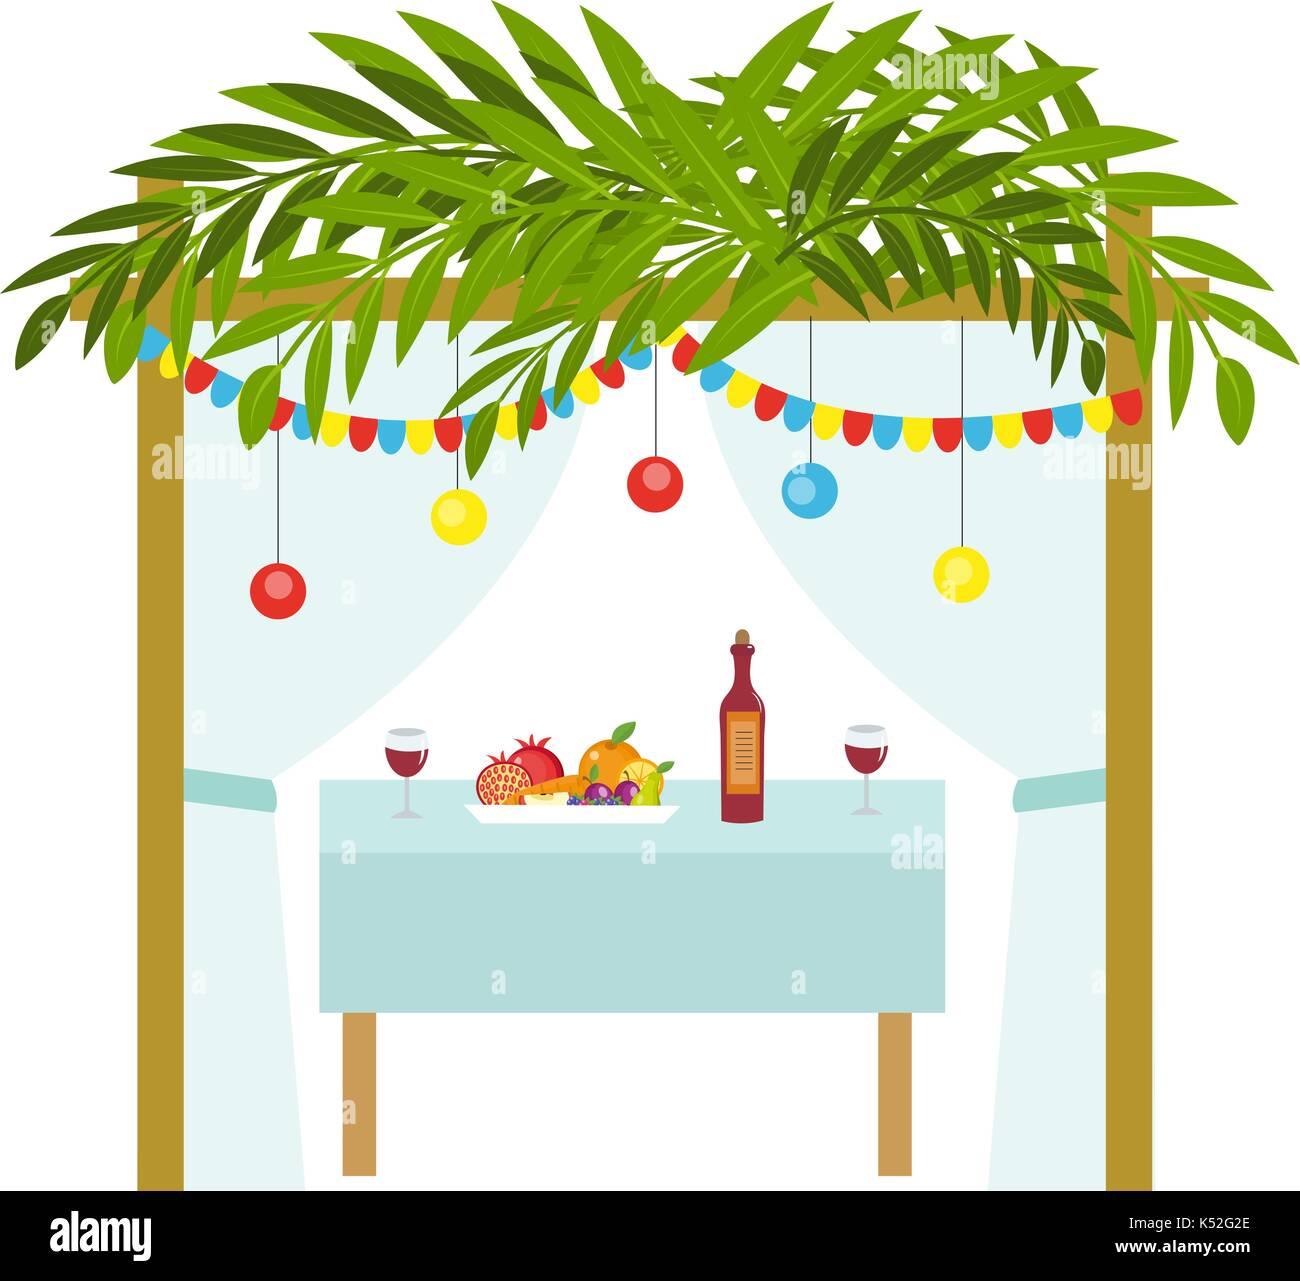 Sukkah for the Sukkot holiday. Jewish tent to celebrate. Isolated on white background. Vector illustration. - Stock Image